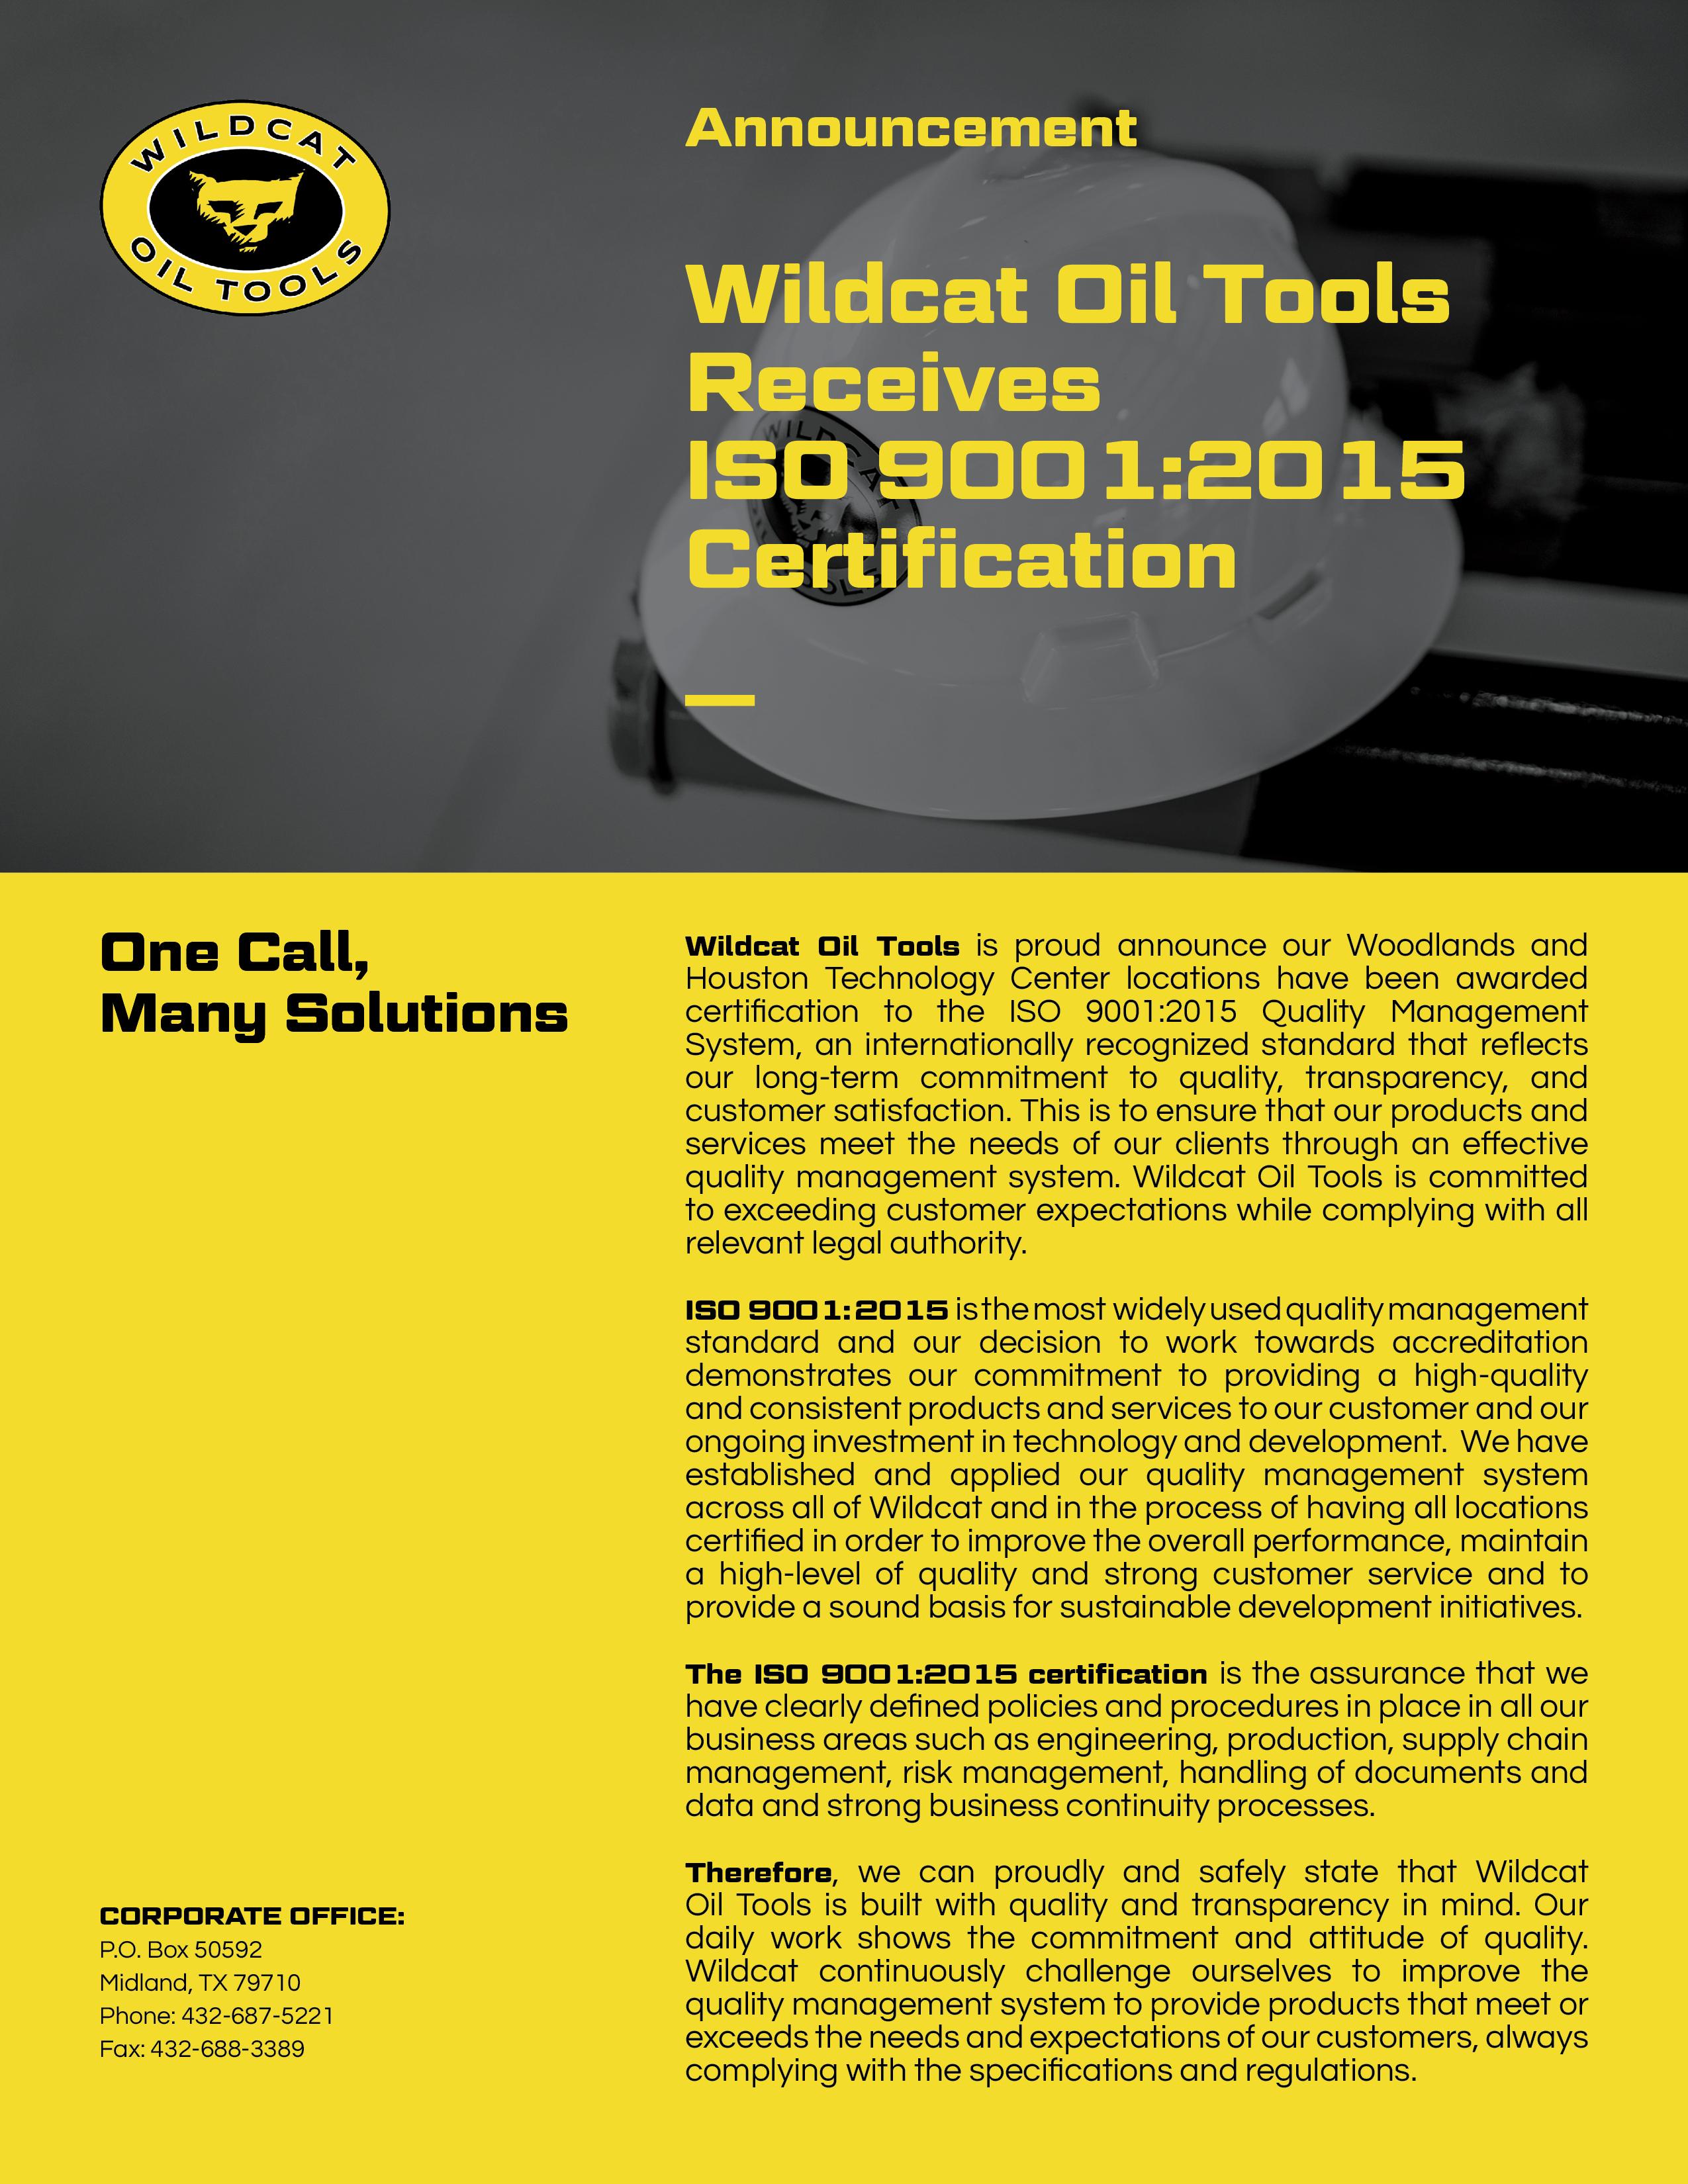 Wildcat Oil Tools